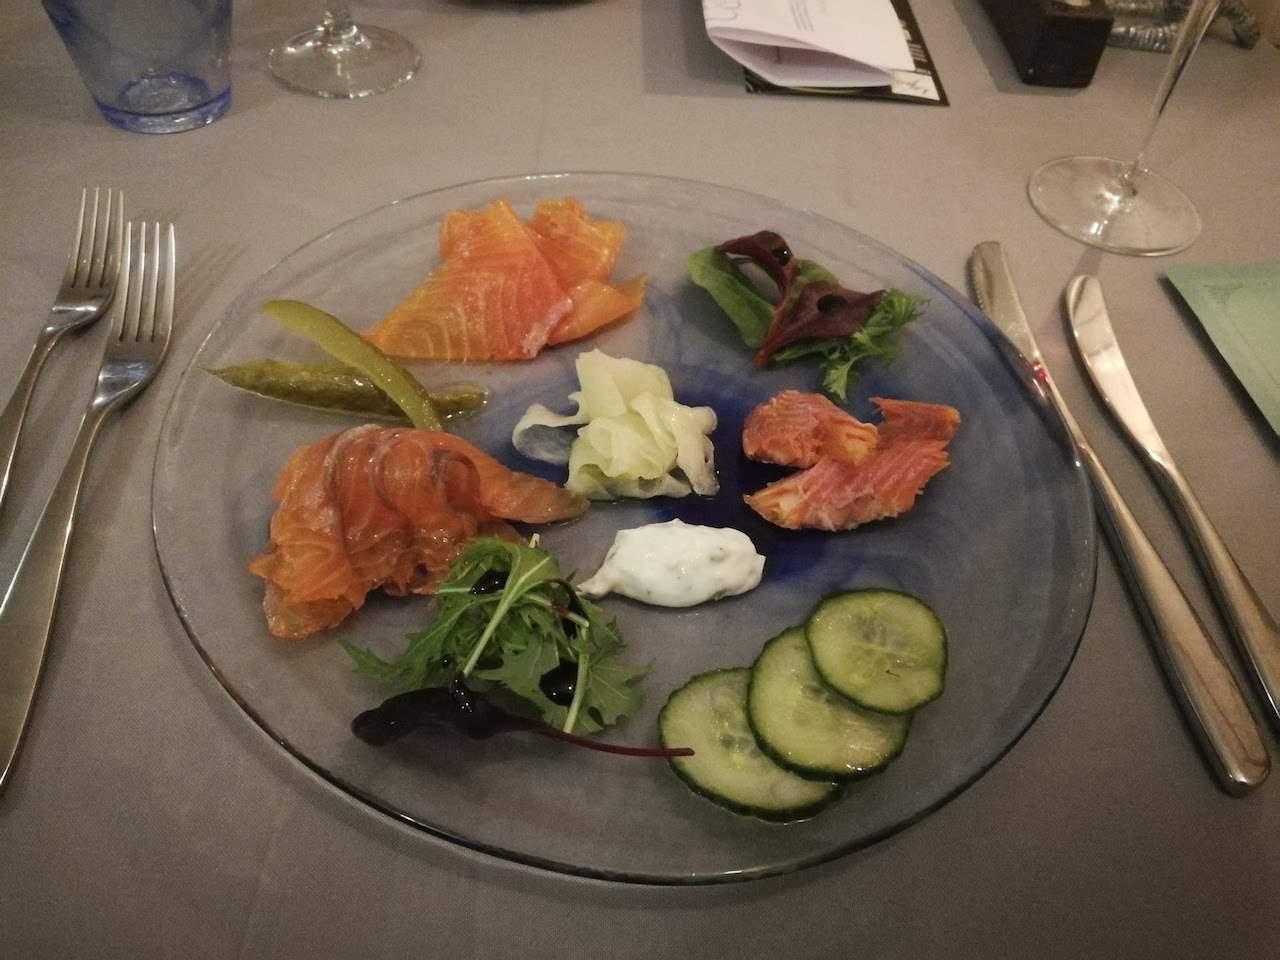 Dining at La Fosse